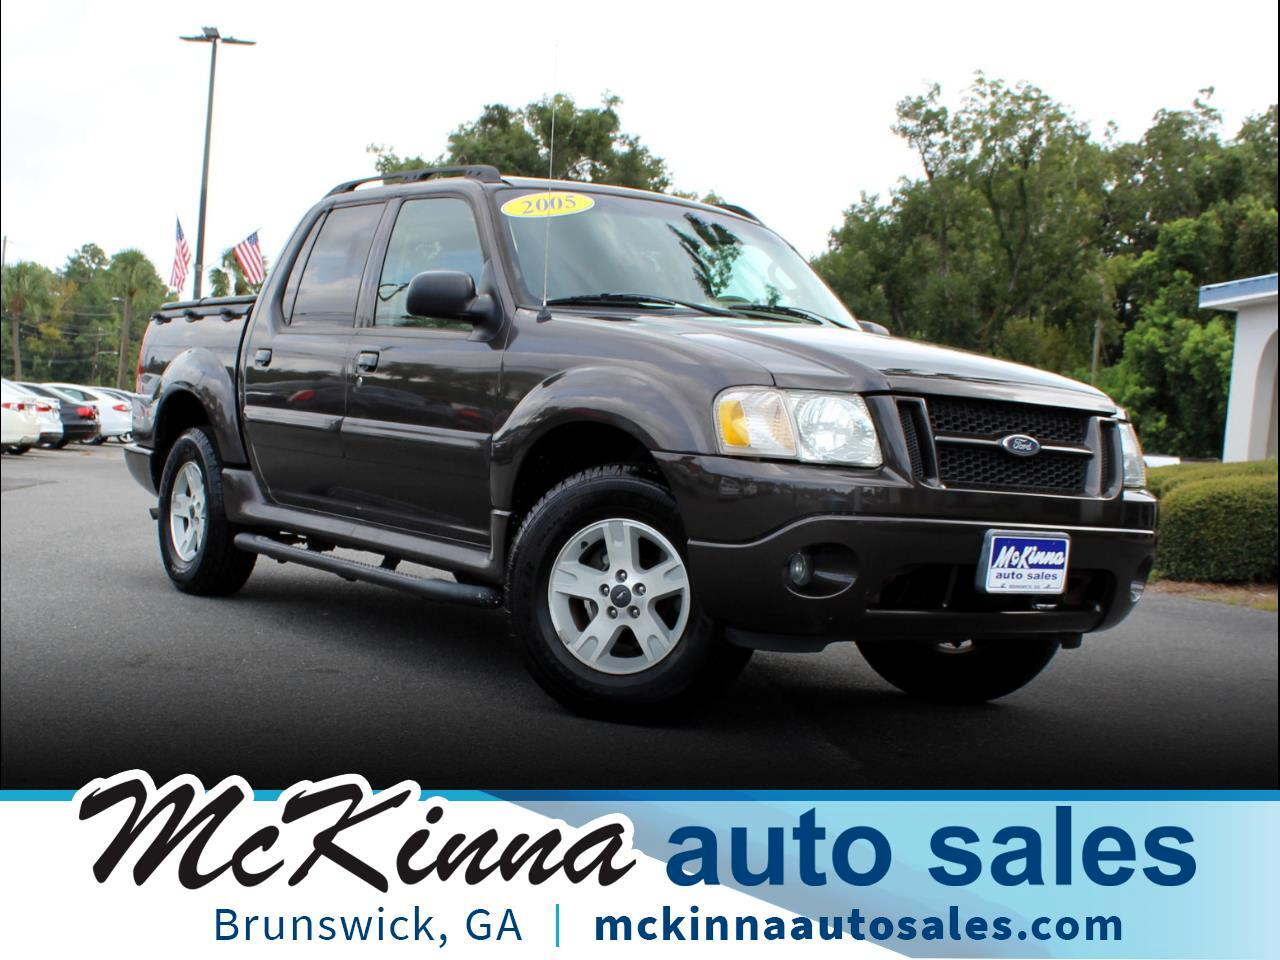 2005 Ford Explorer Sport Trac XLT Premium 2WD